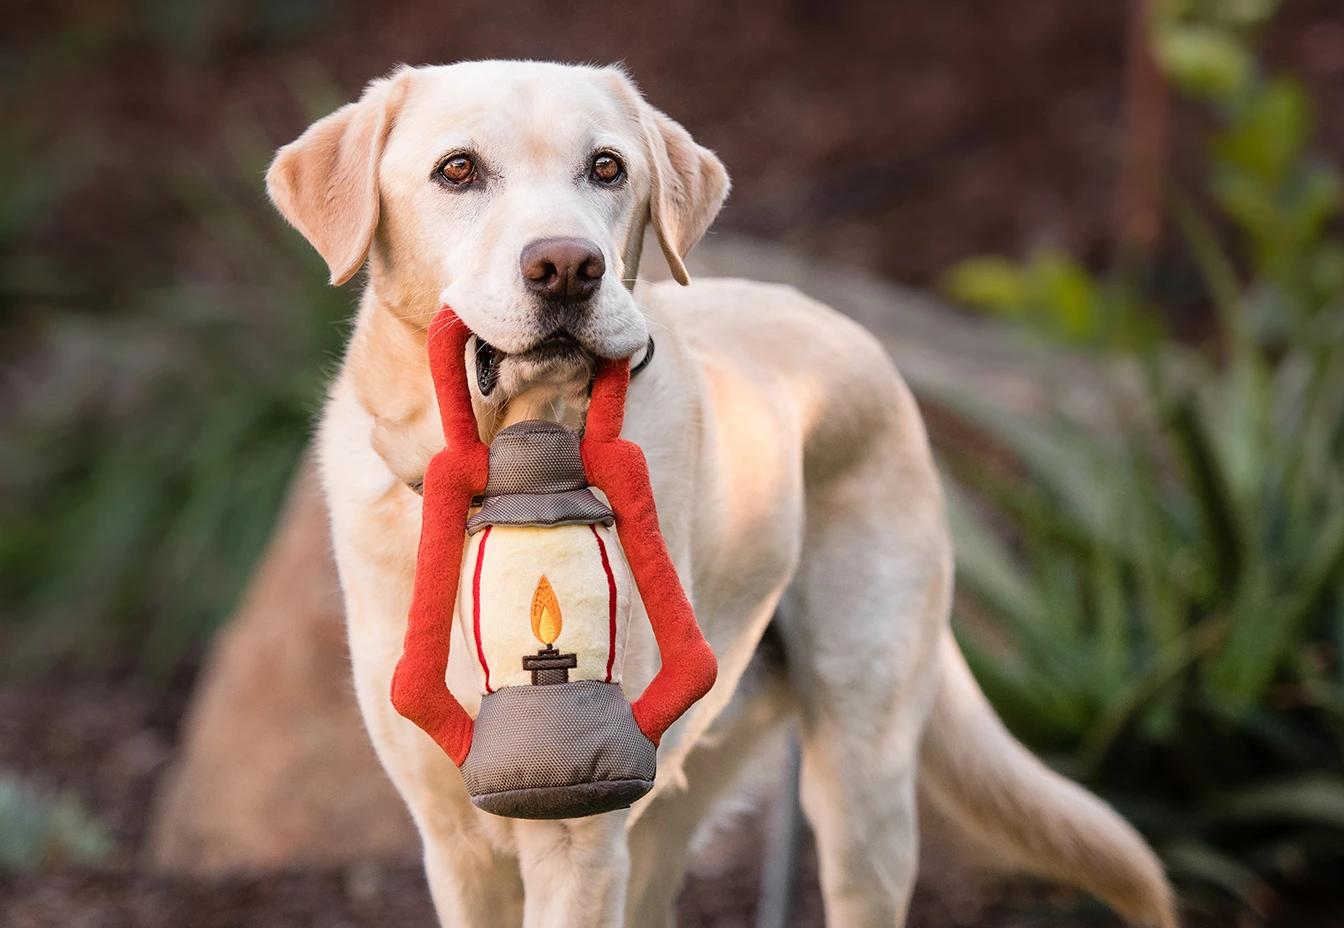 Pack leader lantern